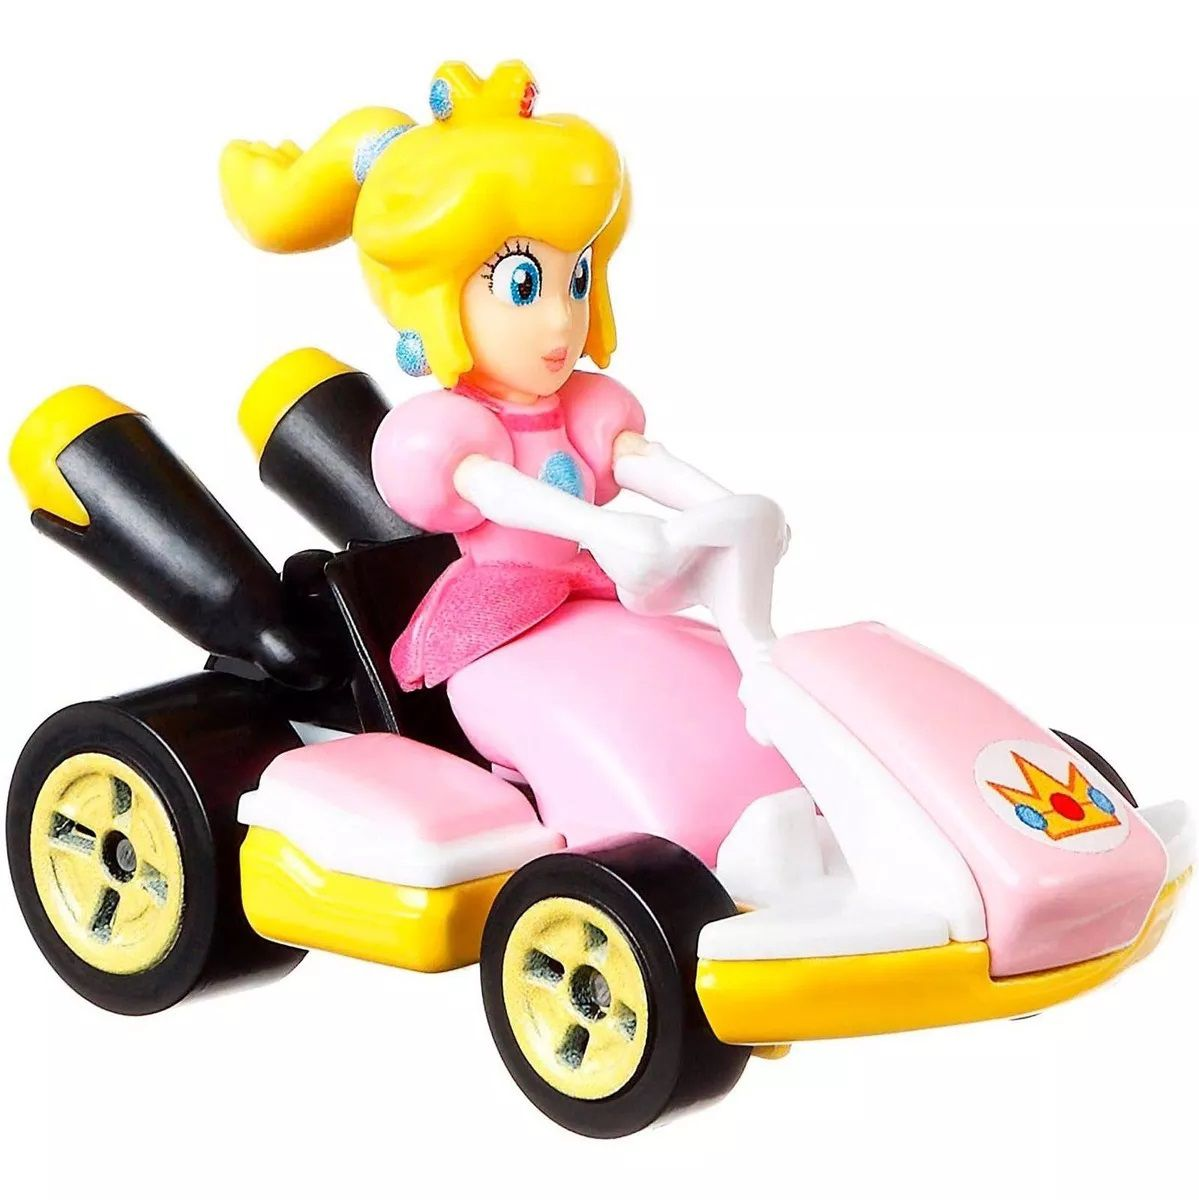 Carrinho Peach (Standart Kart): Mario Kart - Hot Wheels